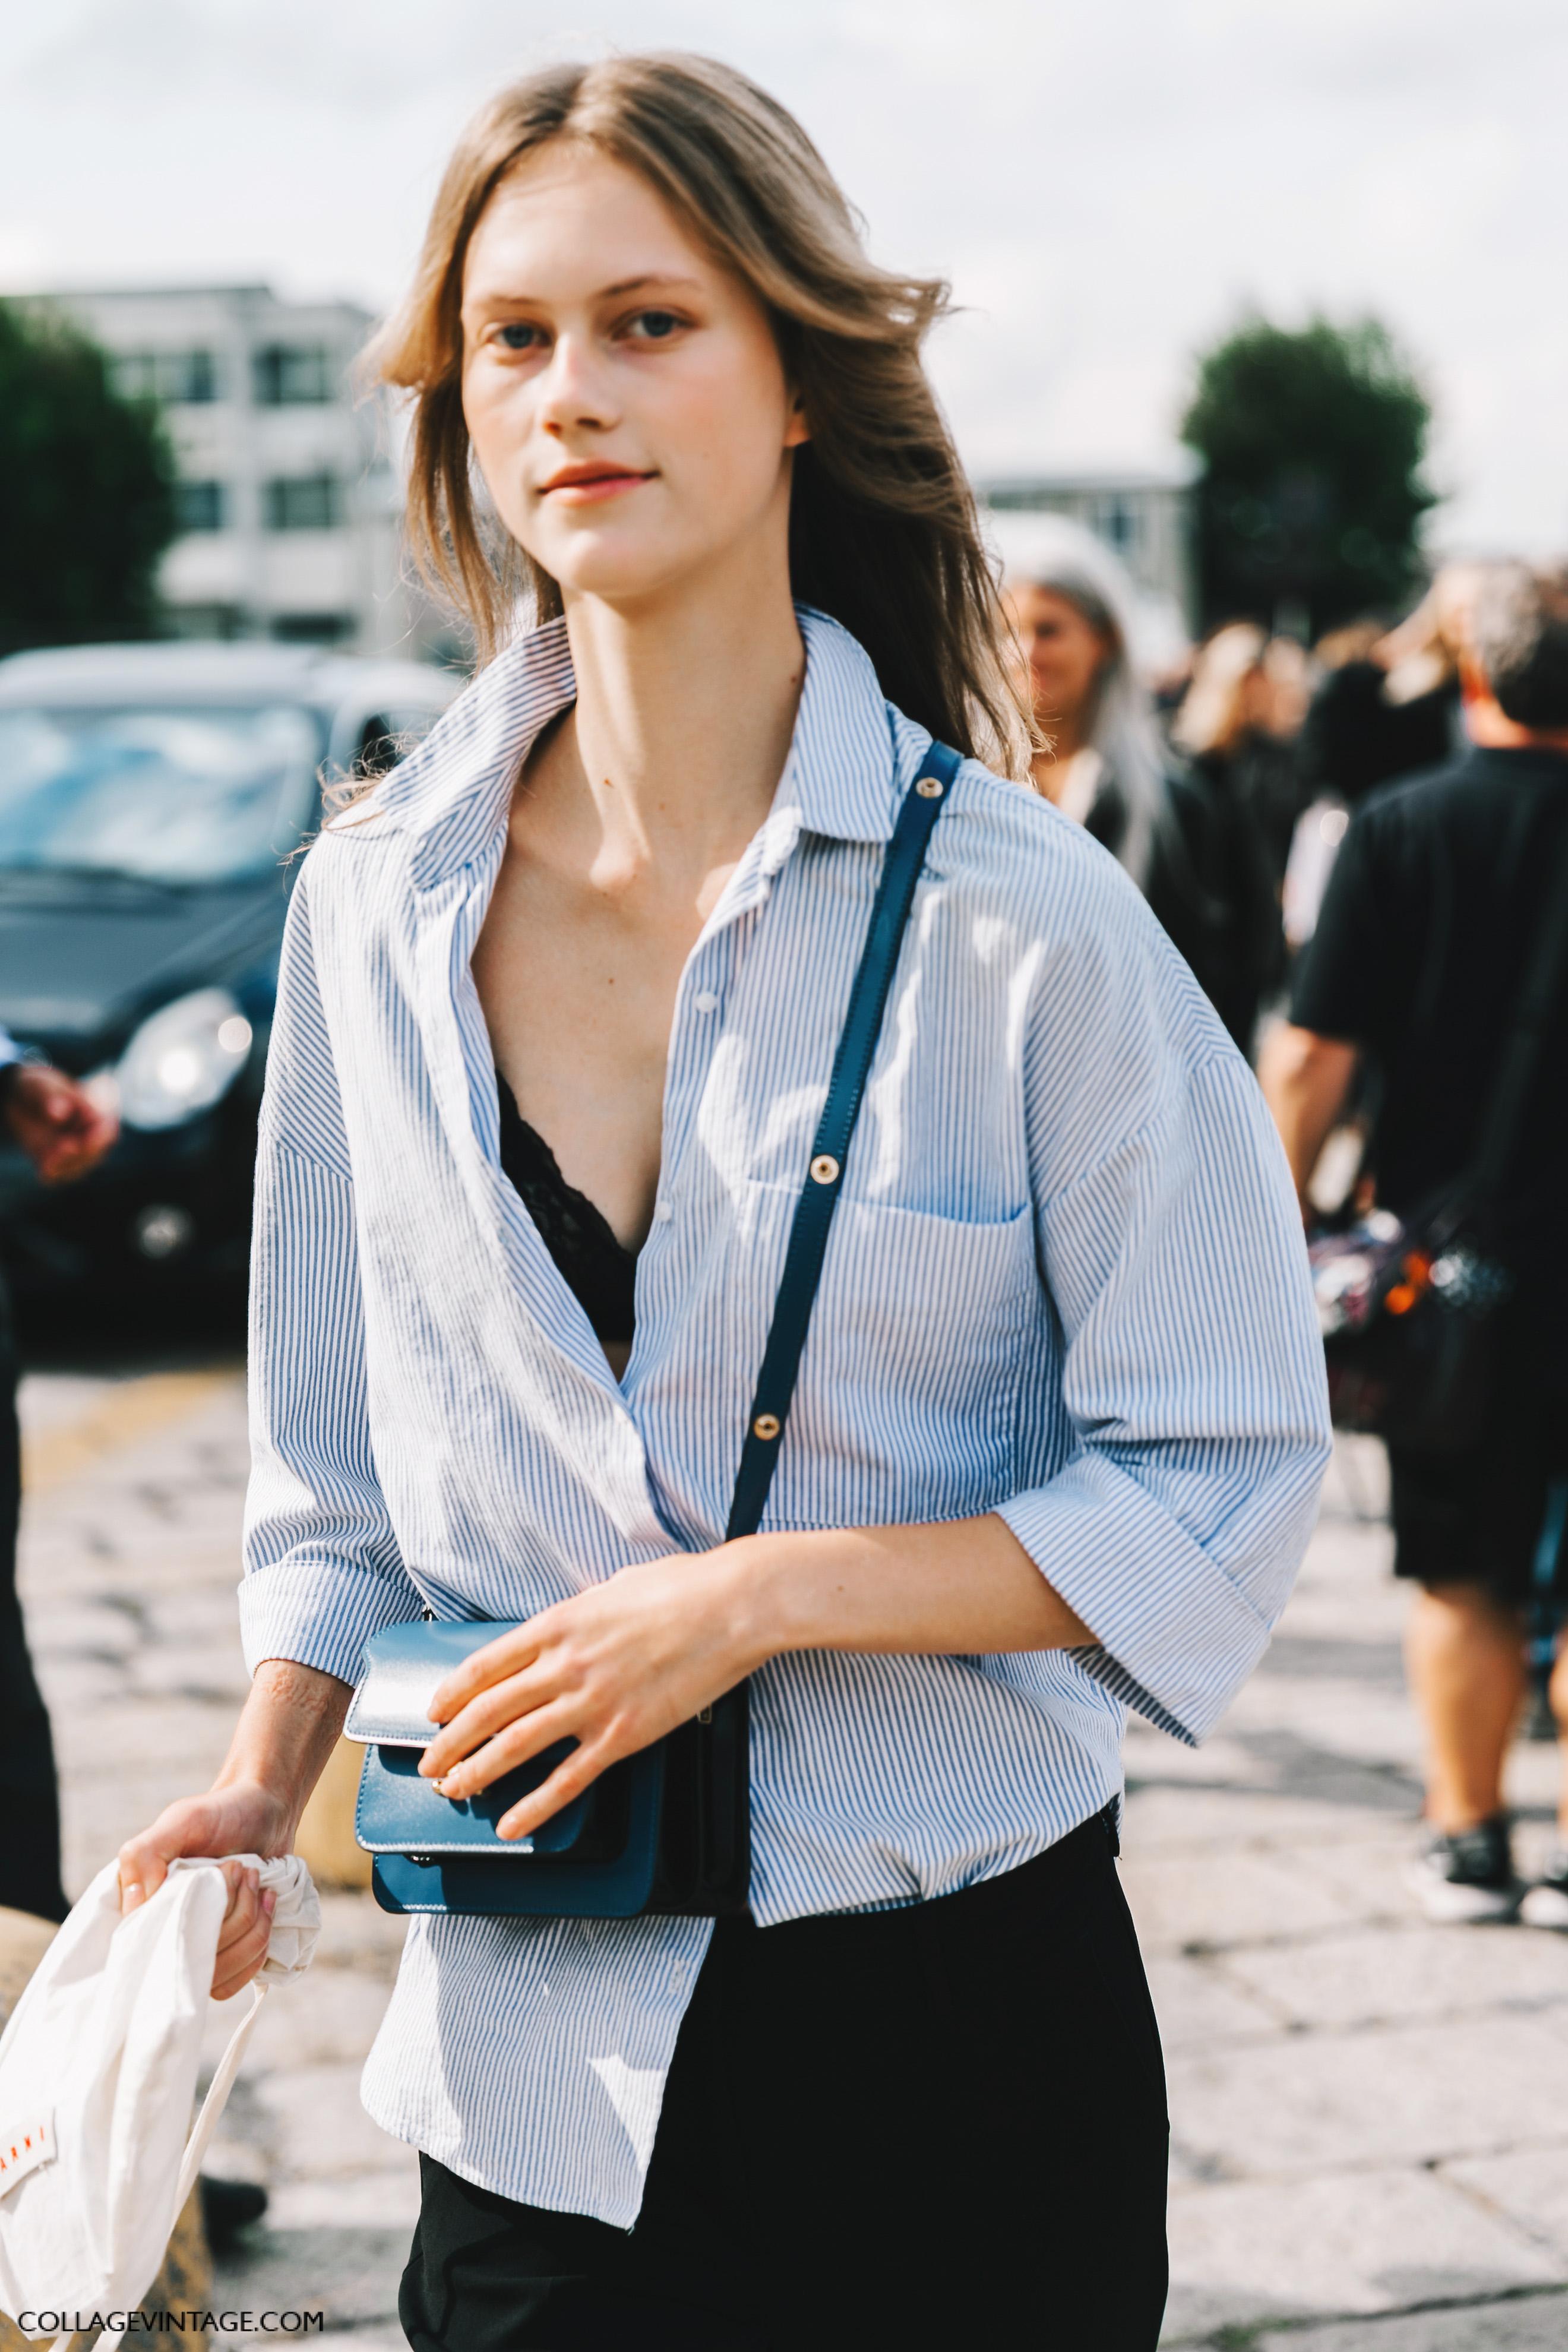 mfw-milan_fashion_week_ss17-street_style-outfits-collage_vintage-gucci-numero_21-alberta_ferreti-97